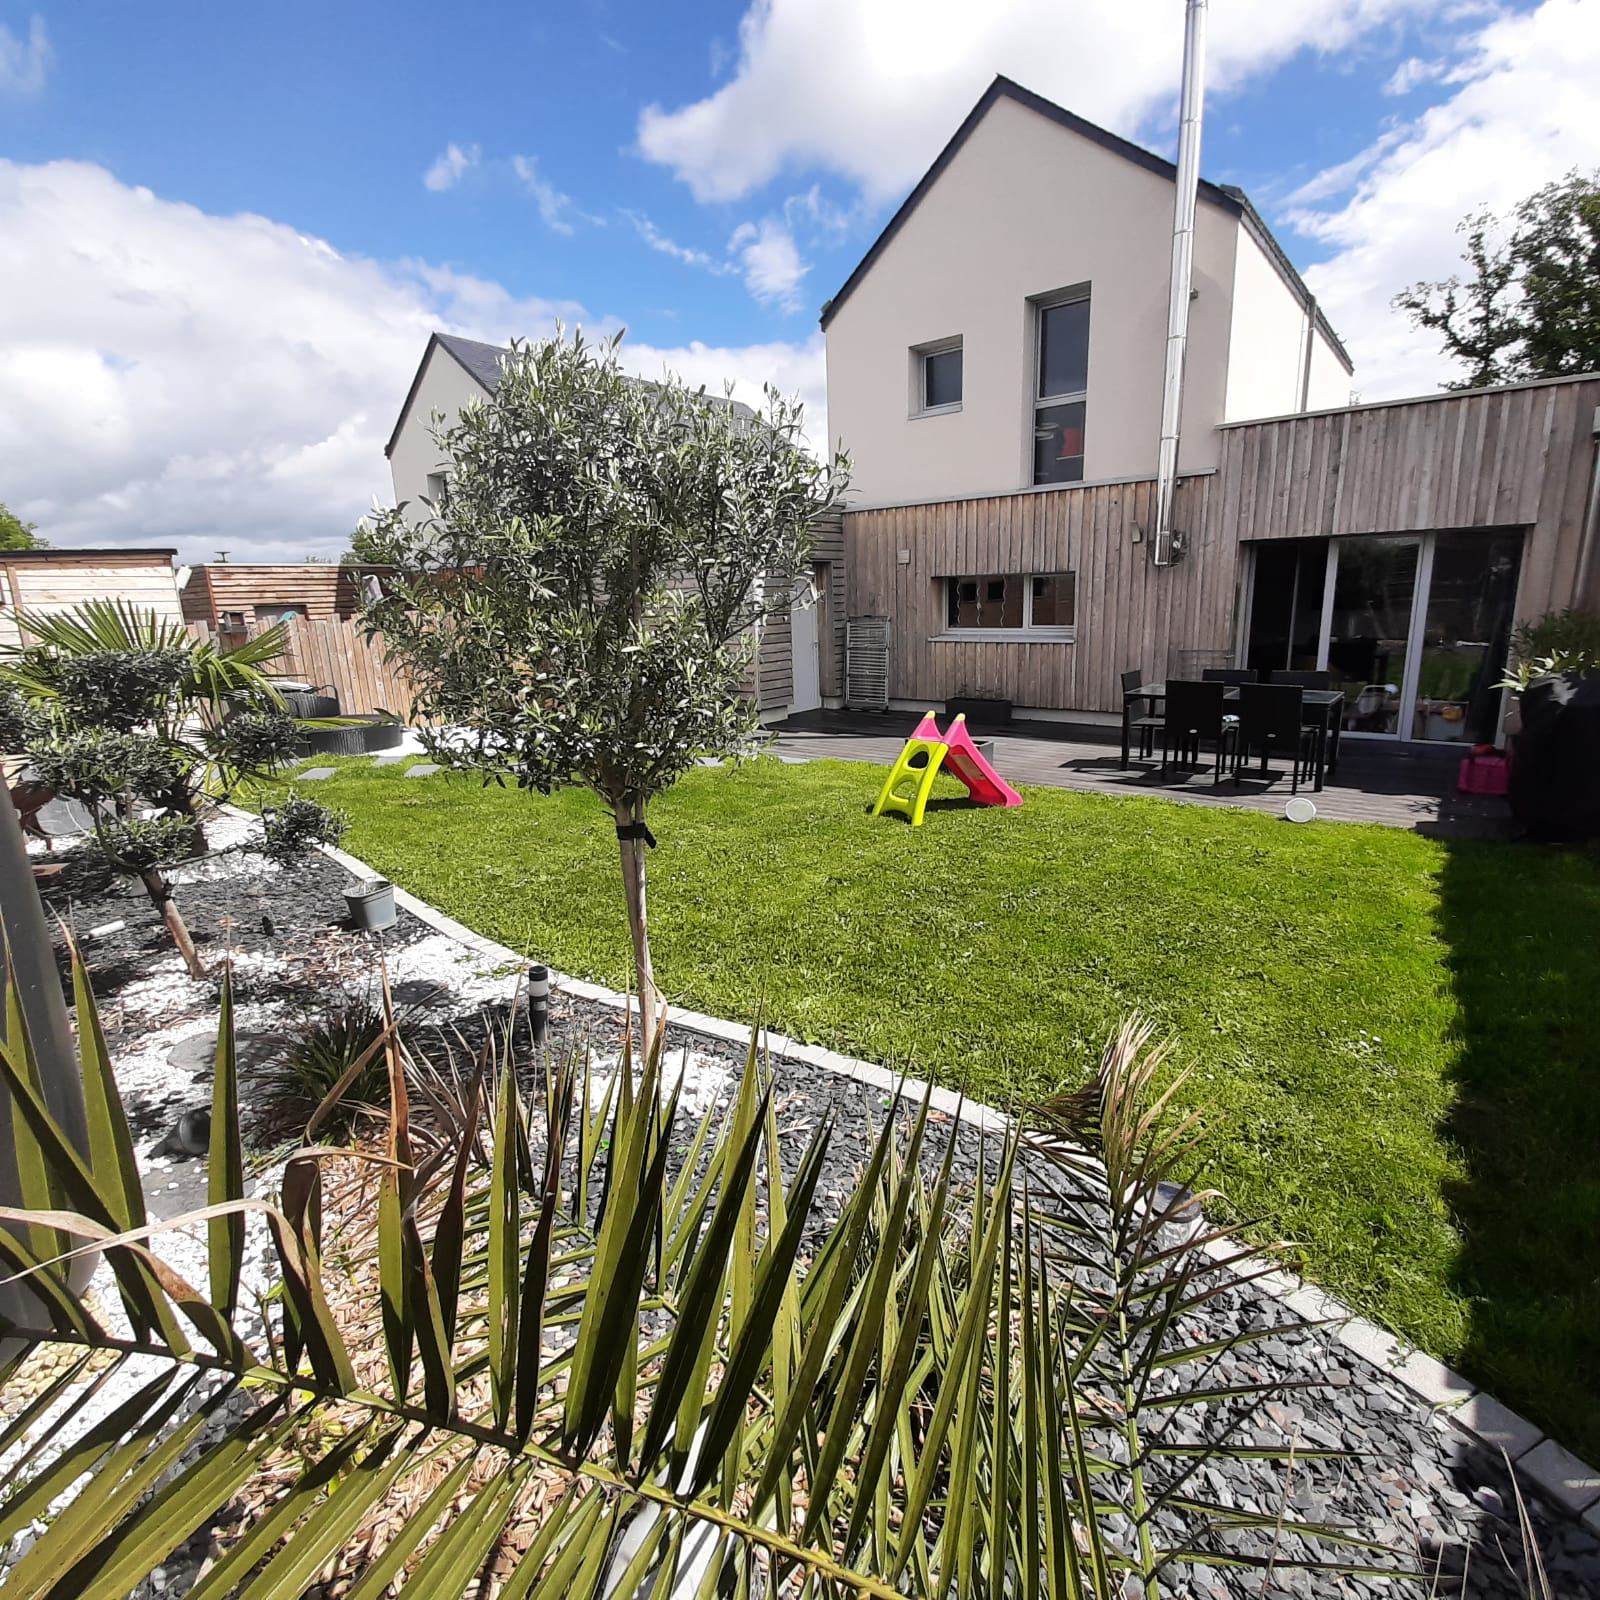 Maison 3 chambres, garage avec jardin paysager – 49070